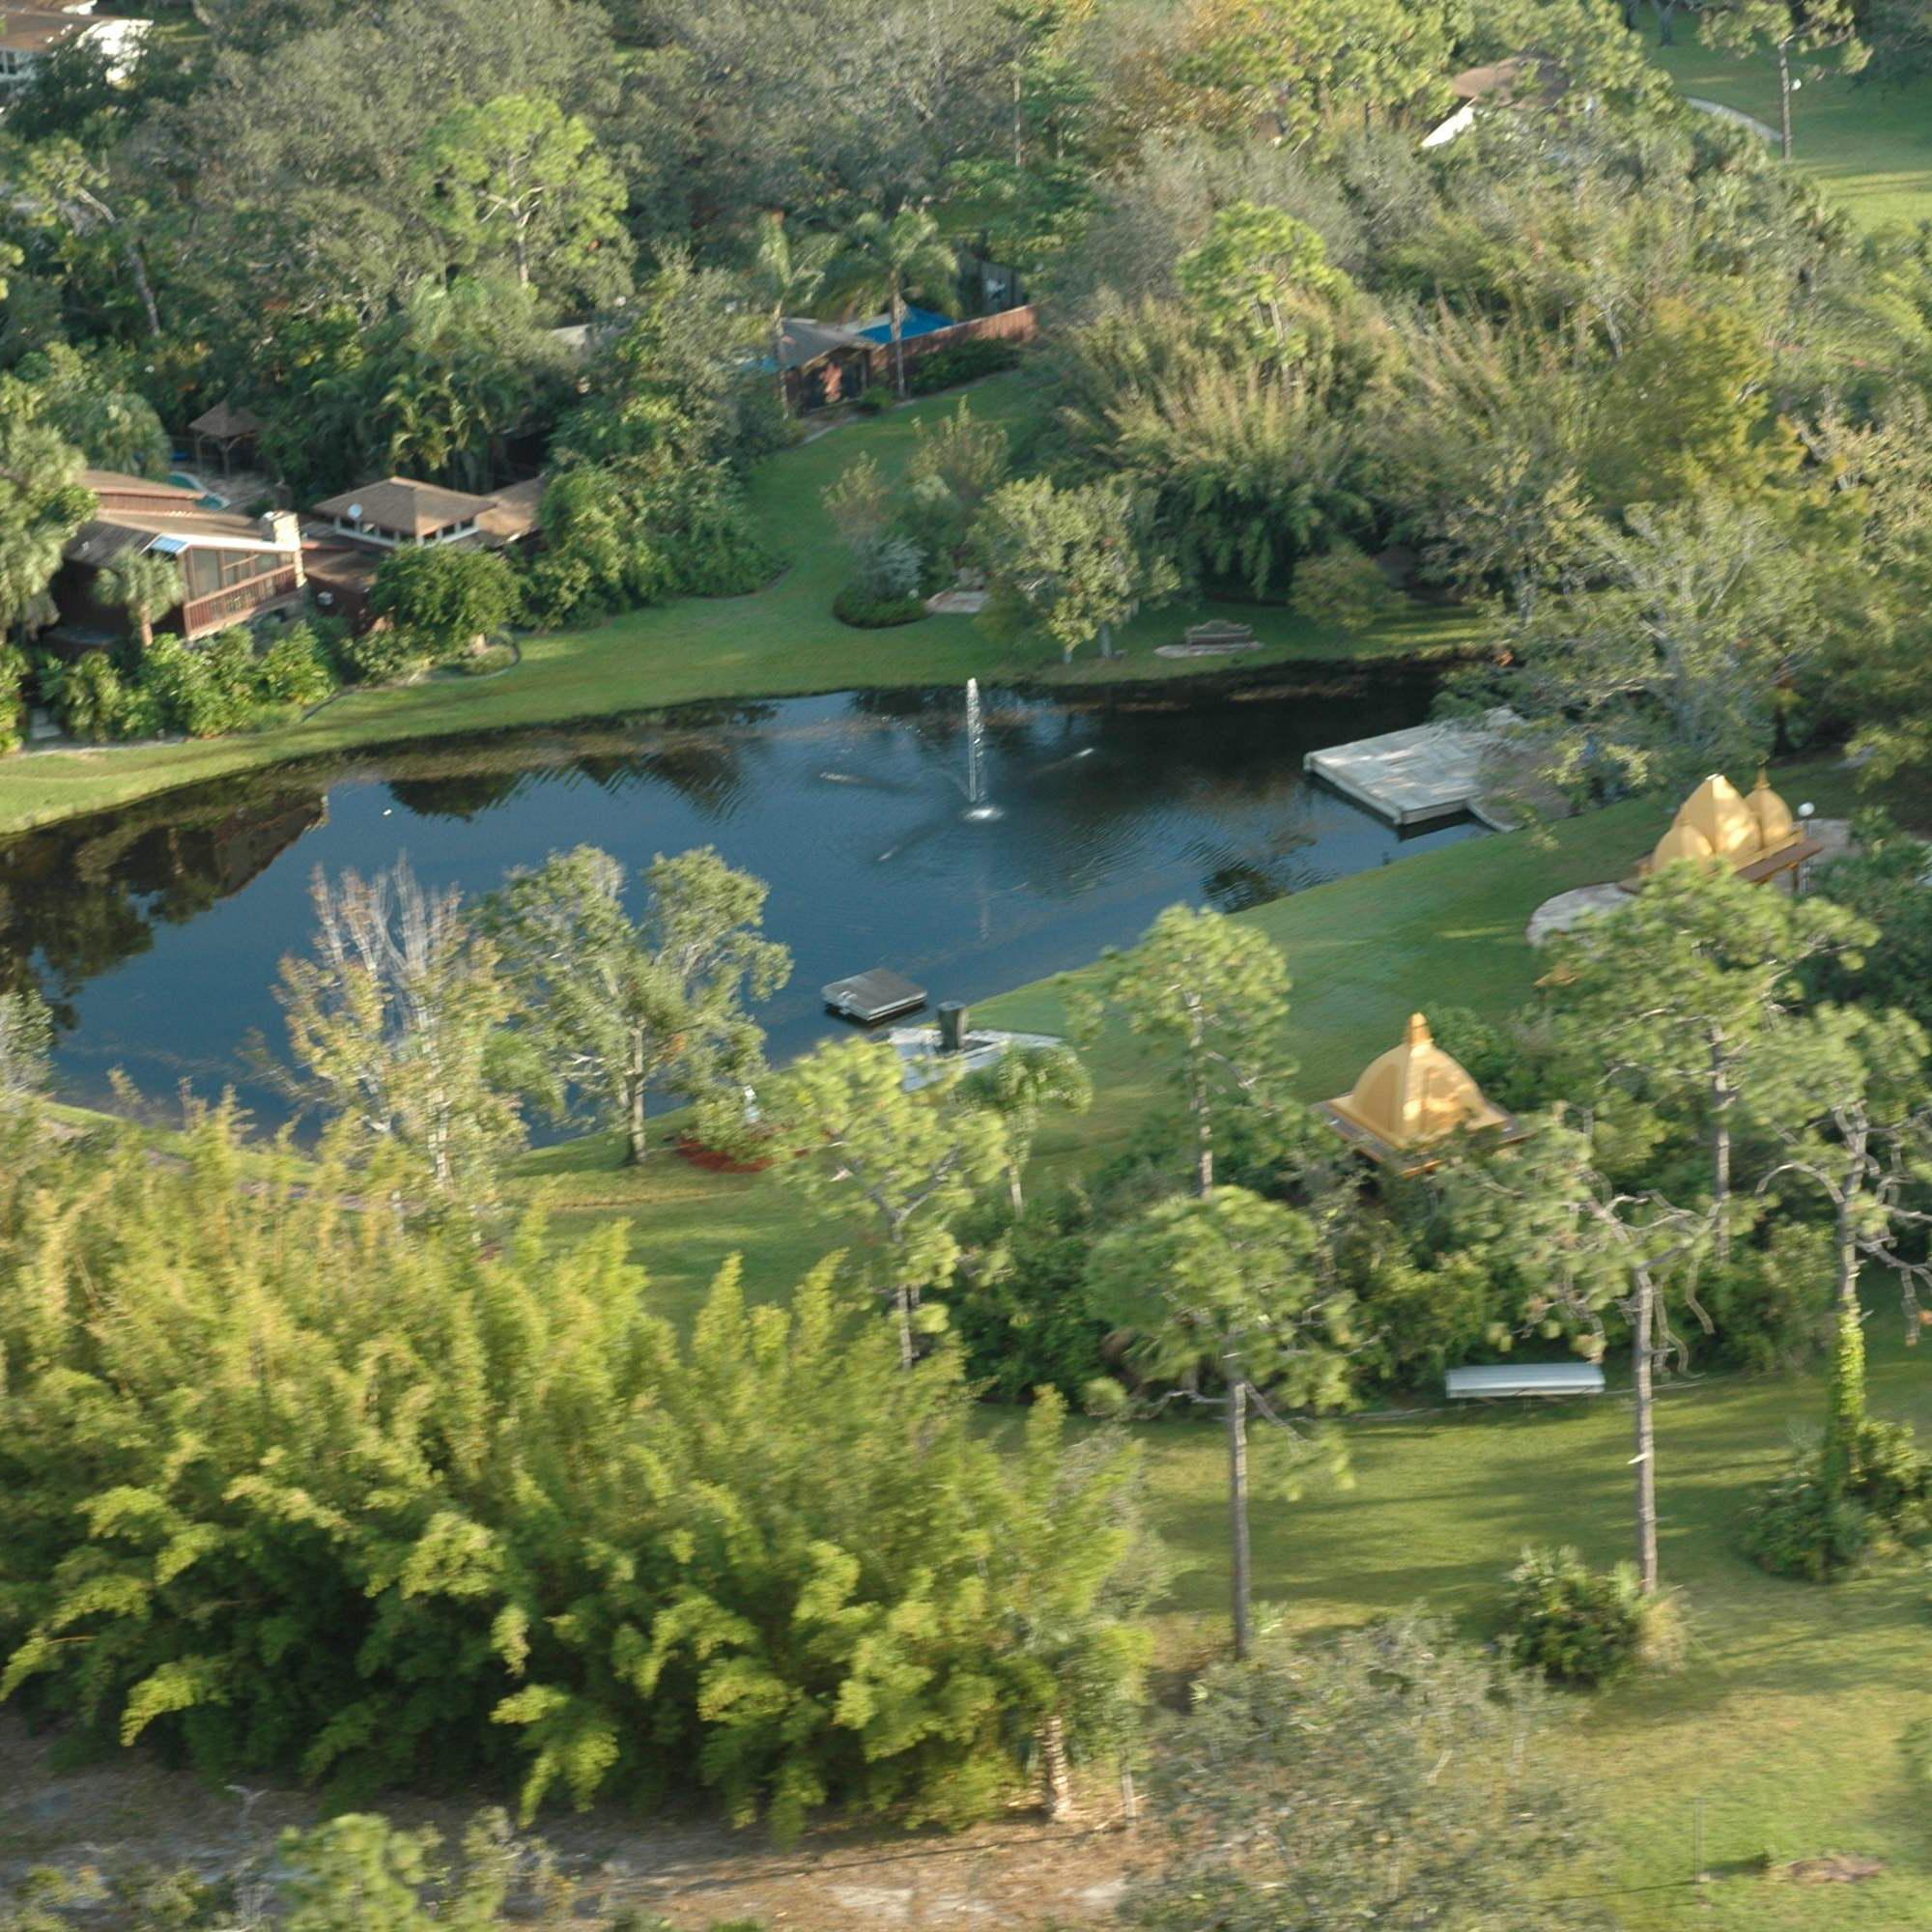 Aerial view of the Kashi Ashram grounds.